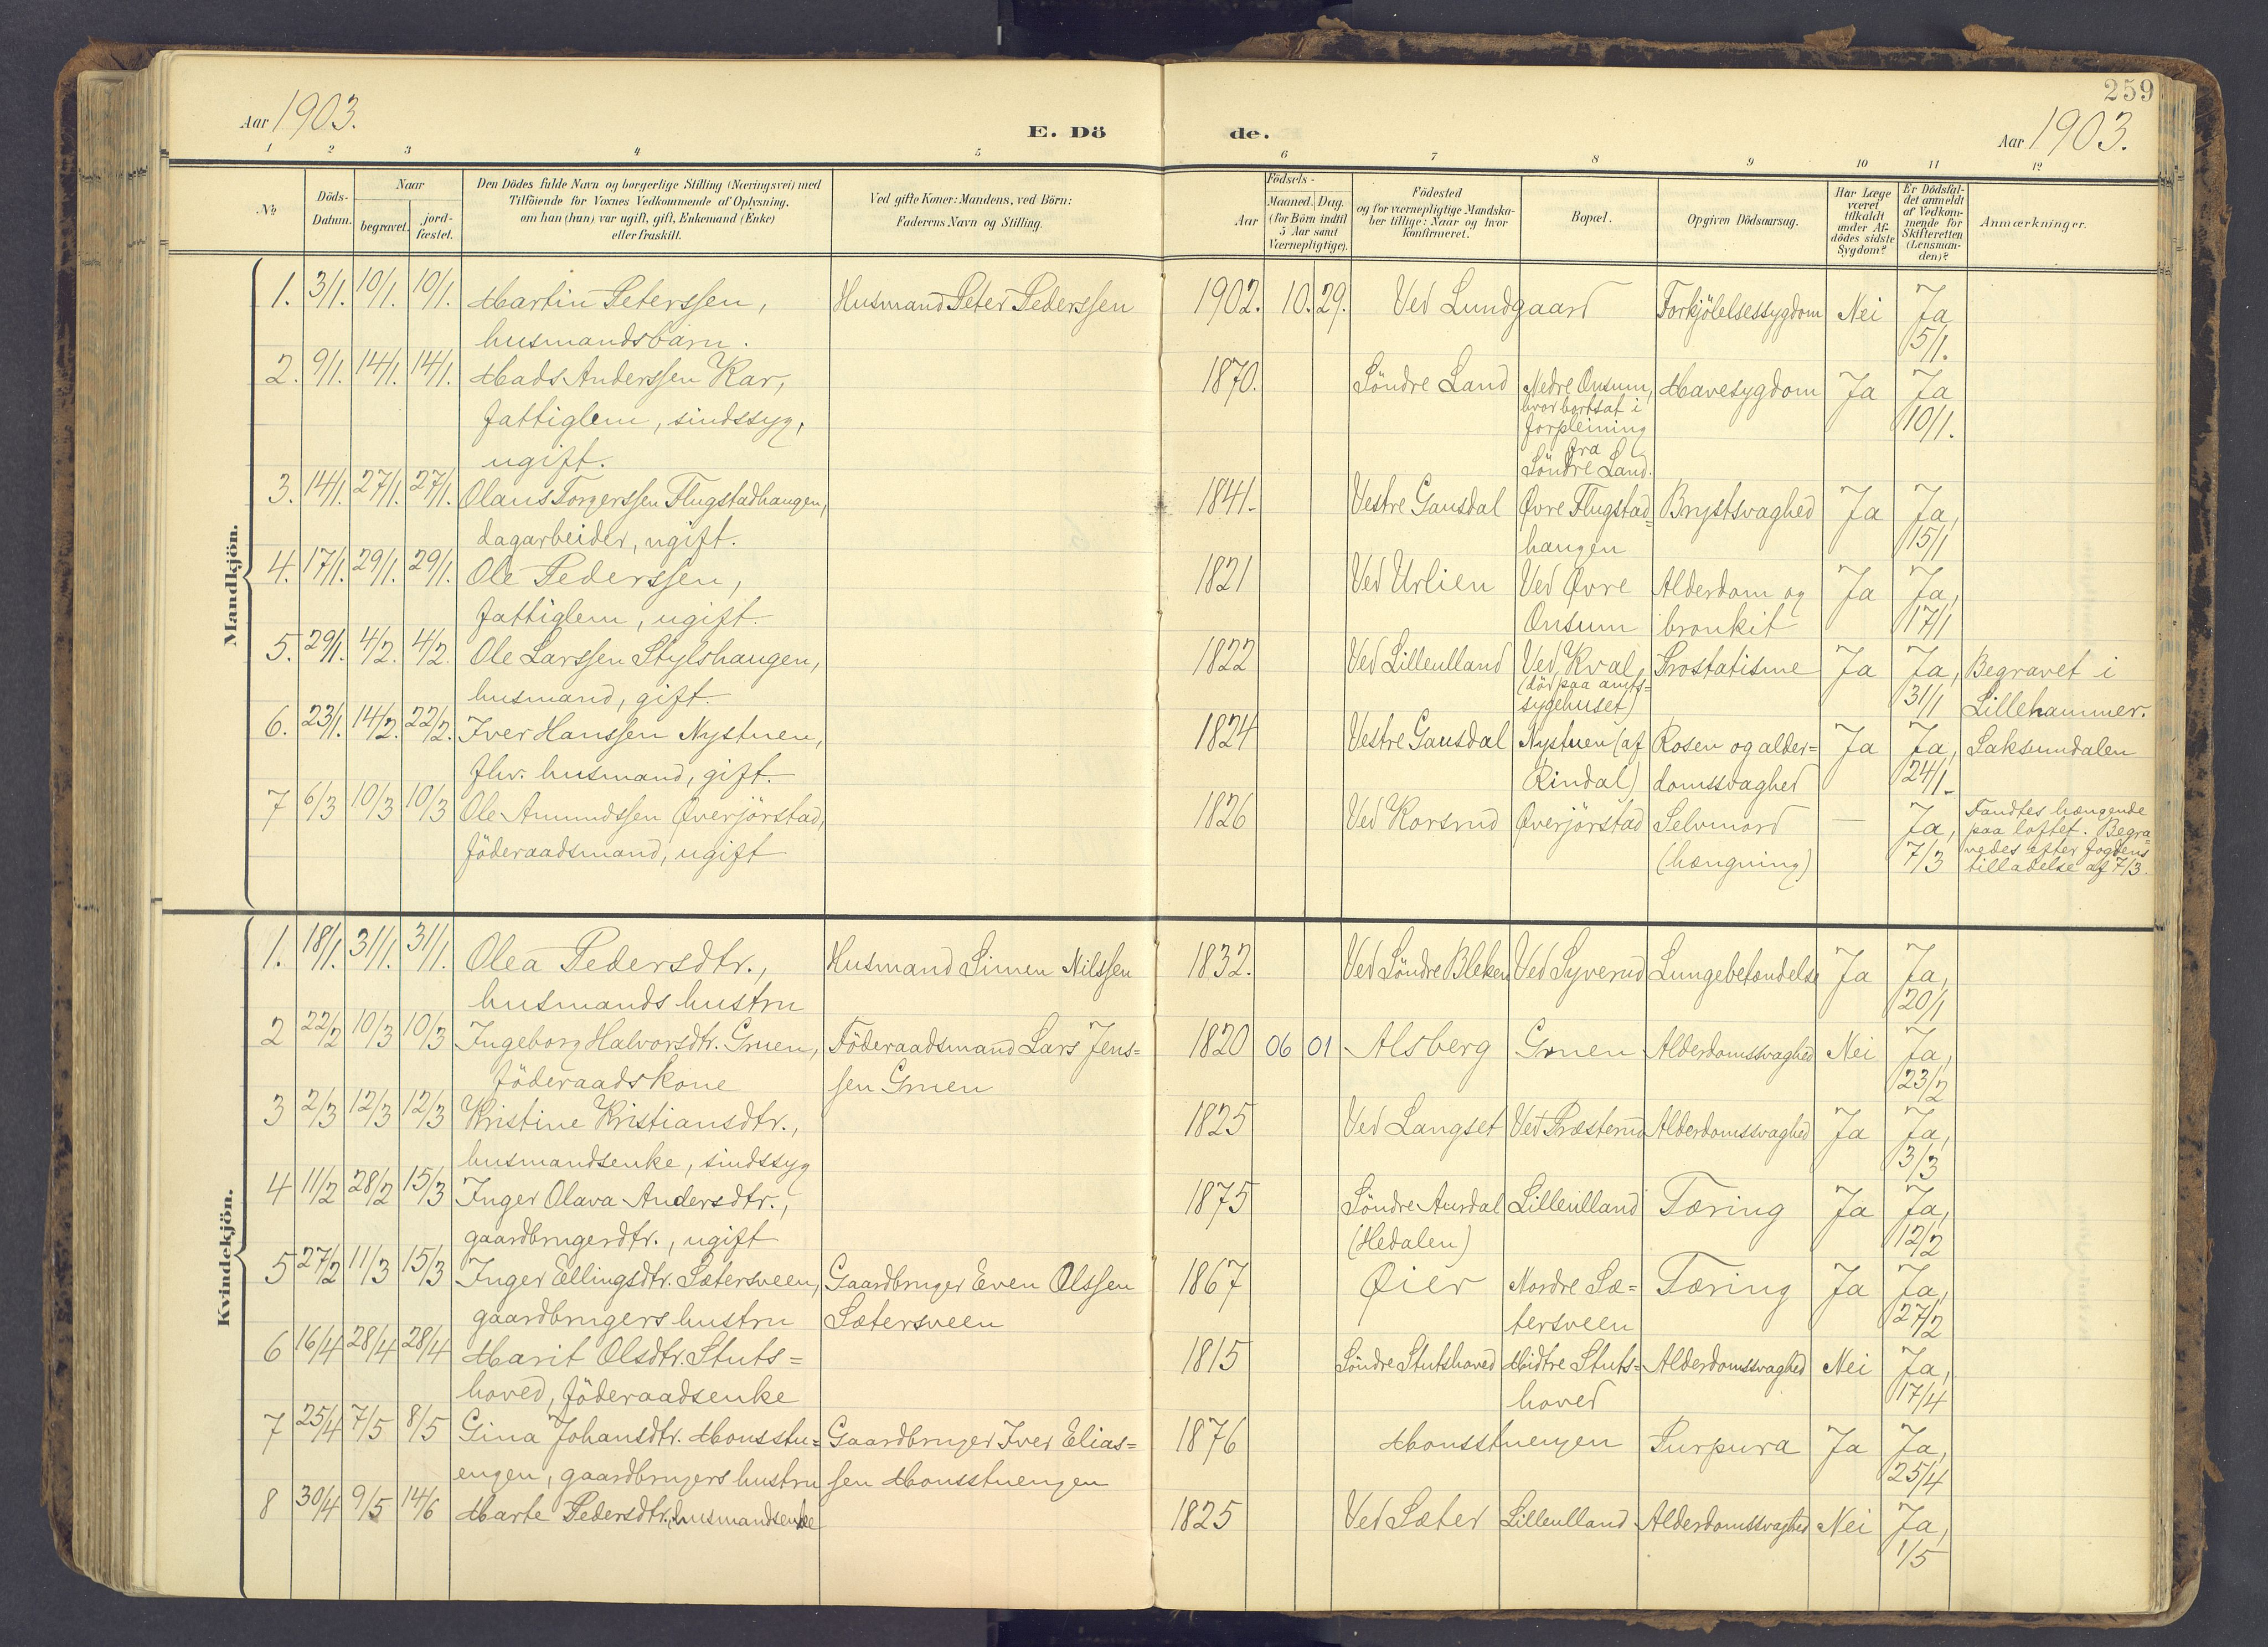 SAH, Fåberg prestekontor, Ministerialbok nr. 12, 1899-1915, s. 259